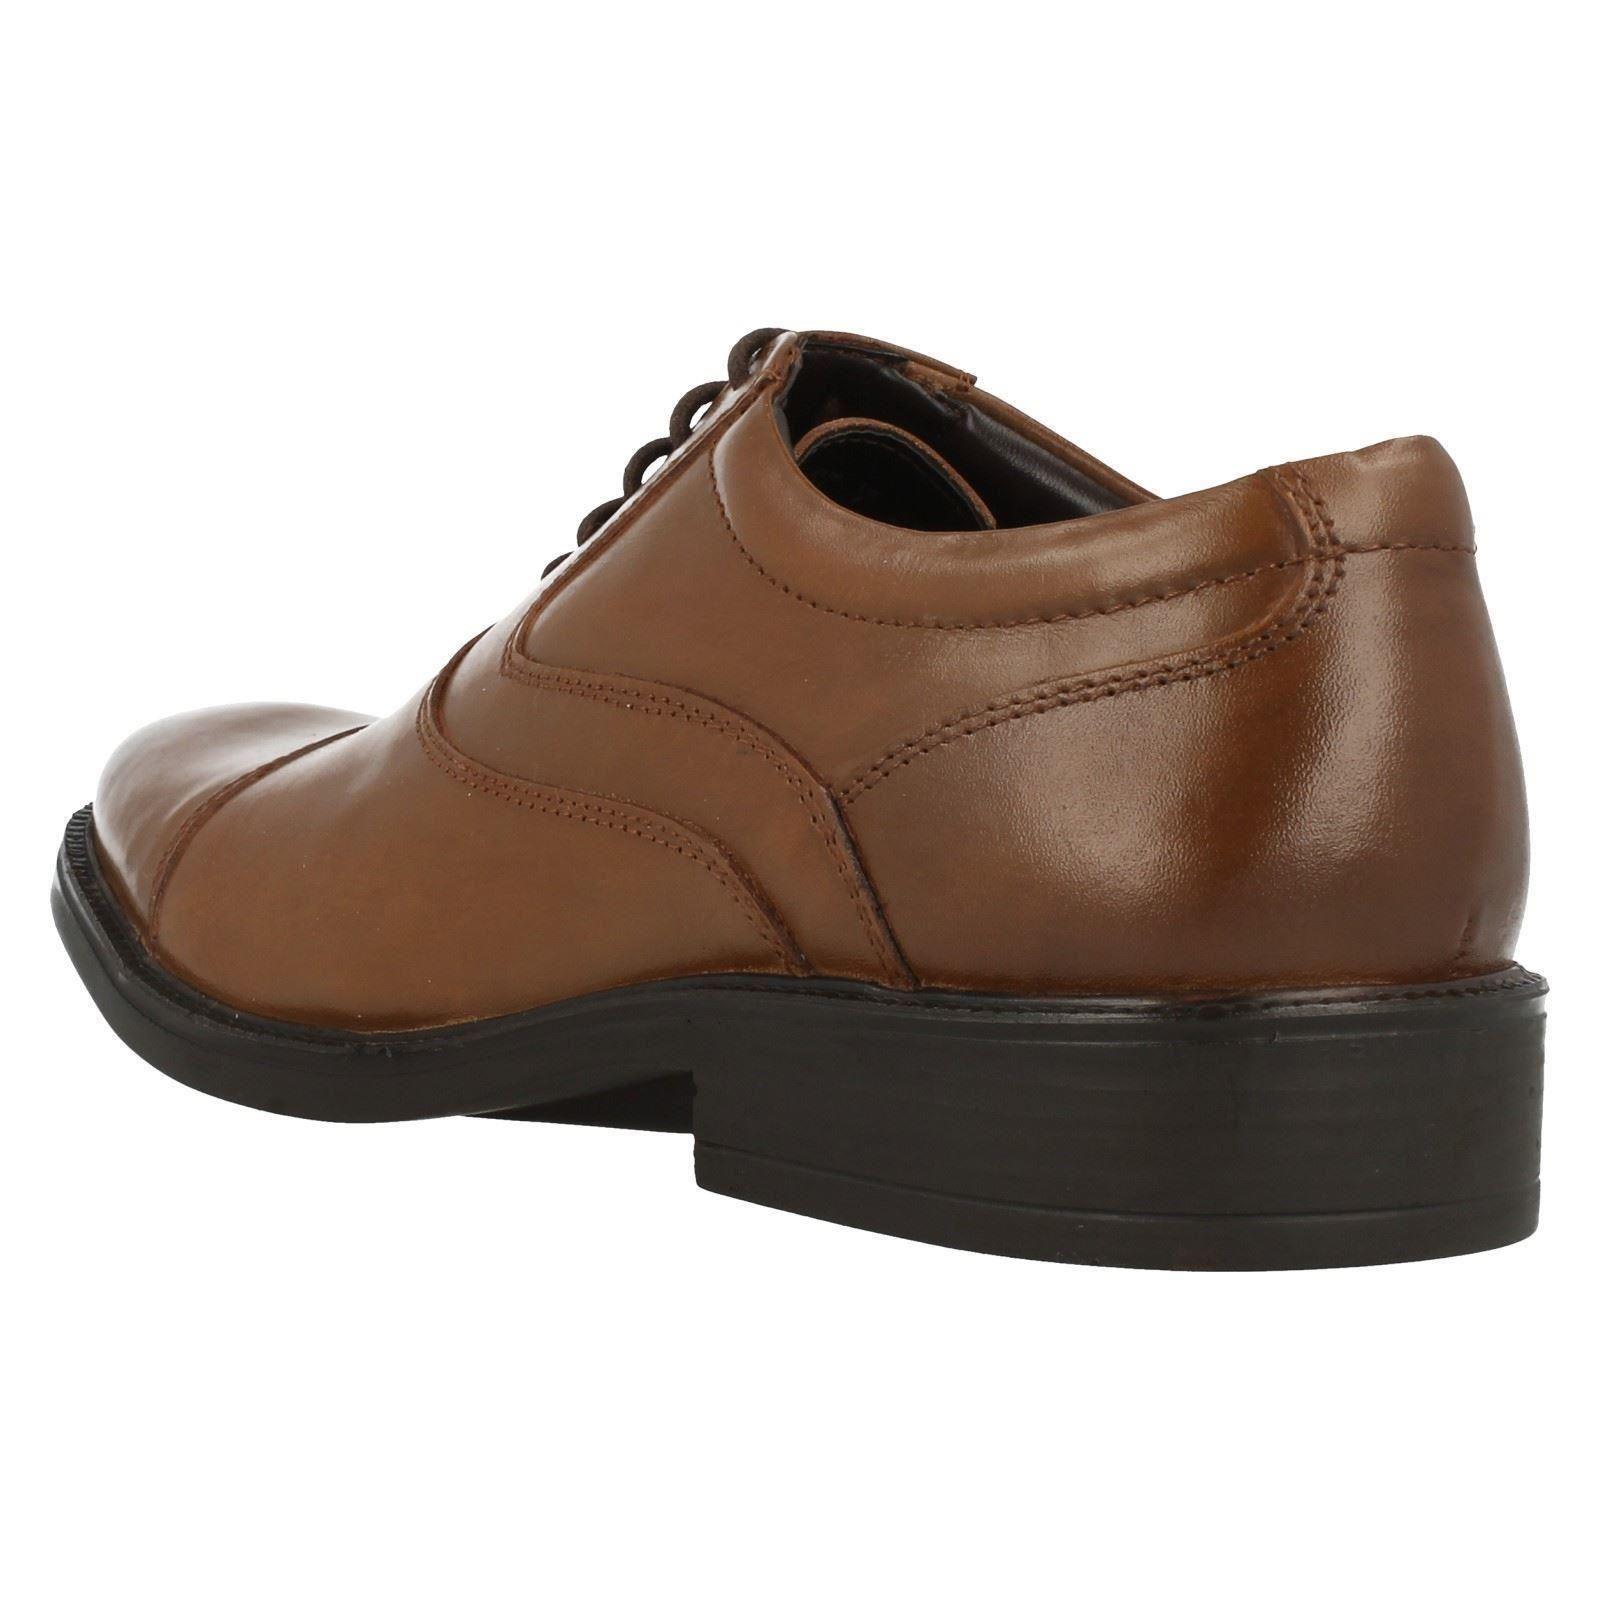 Rockford Shoe Store Rockford Mi